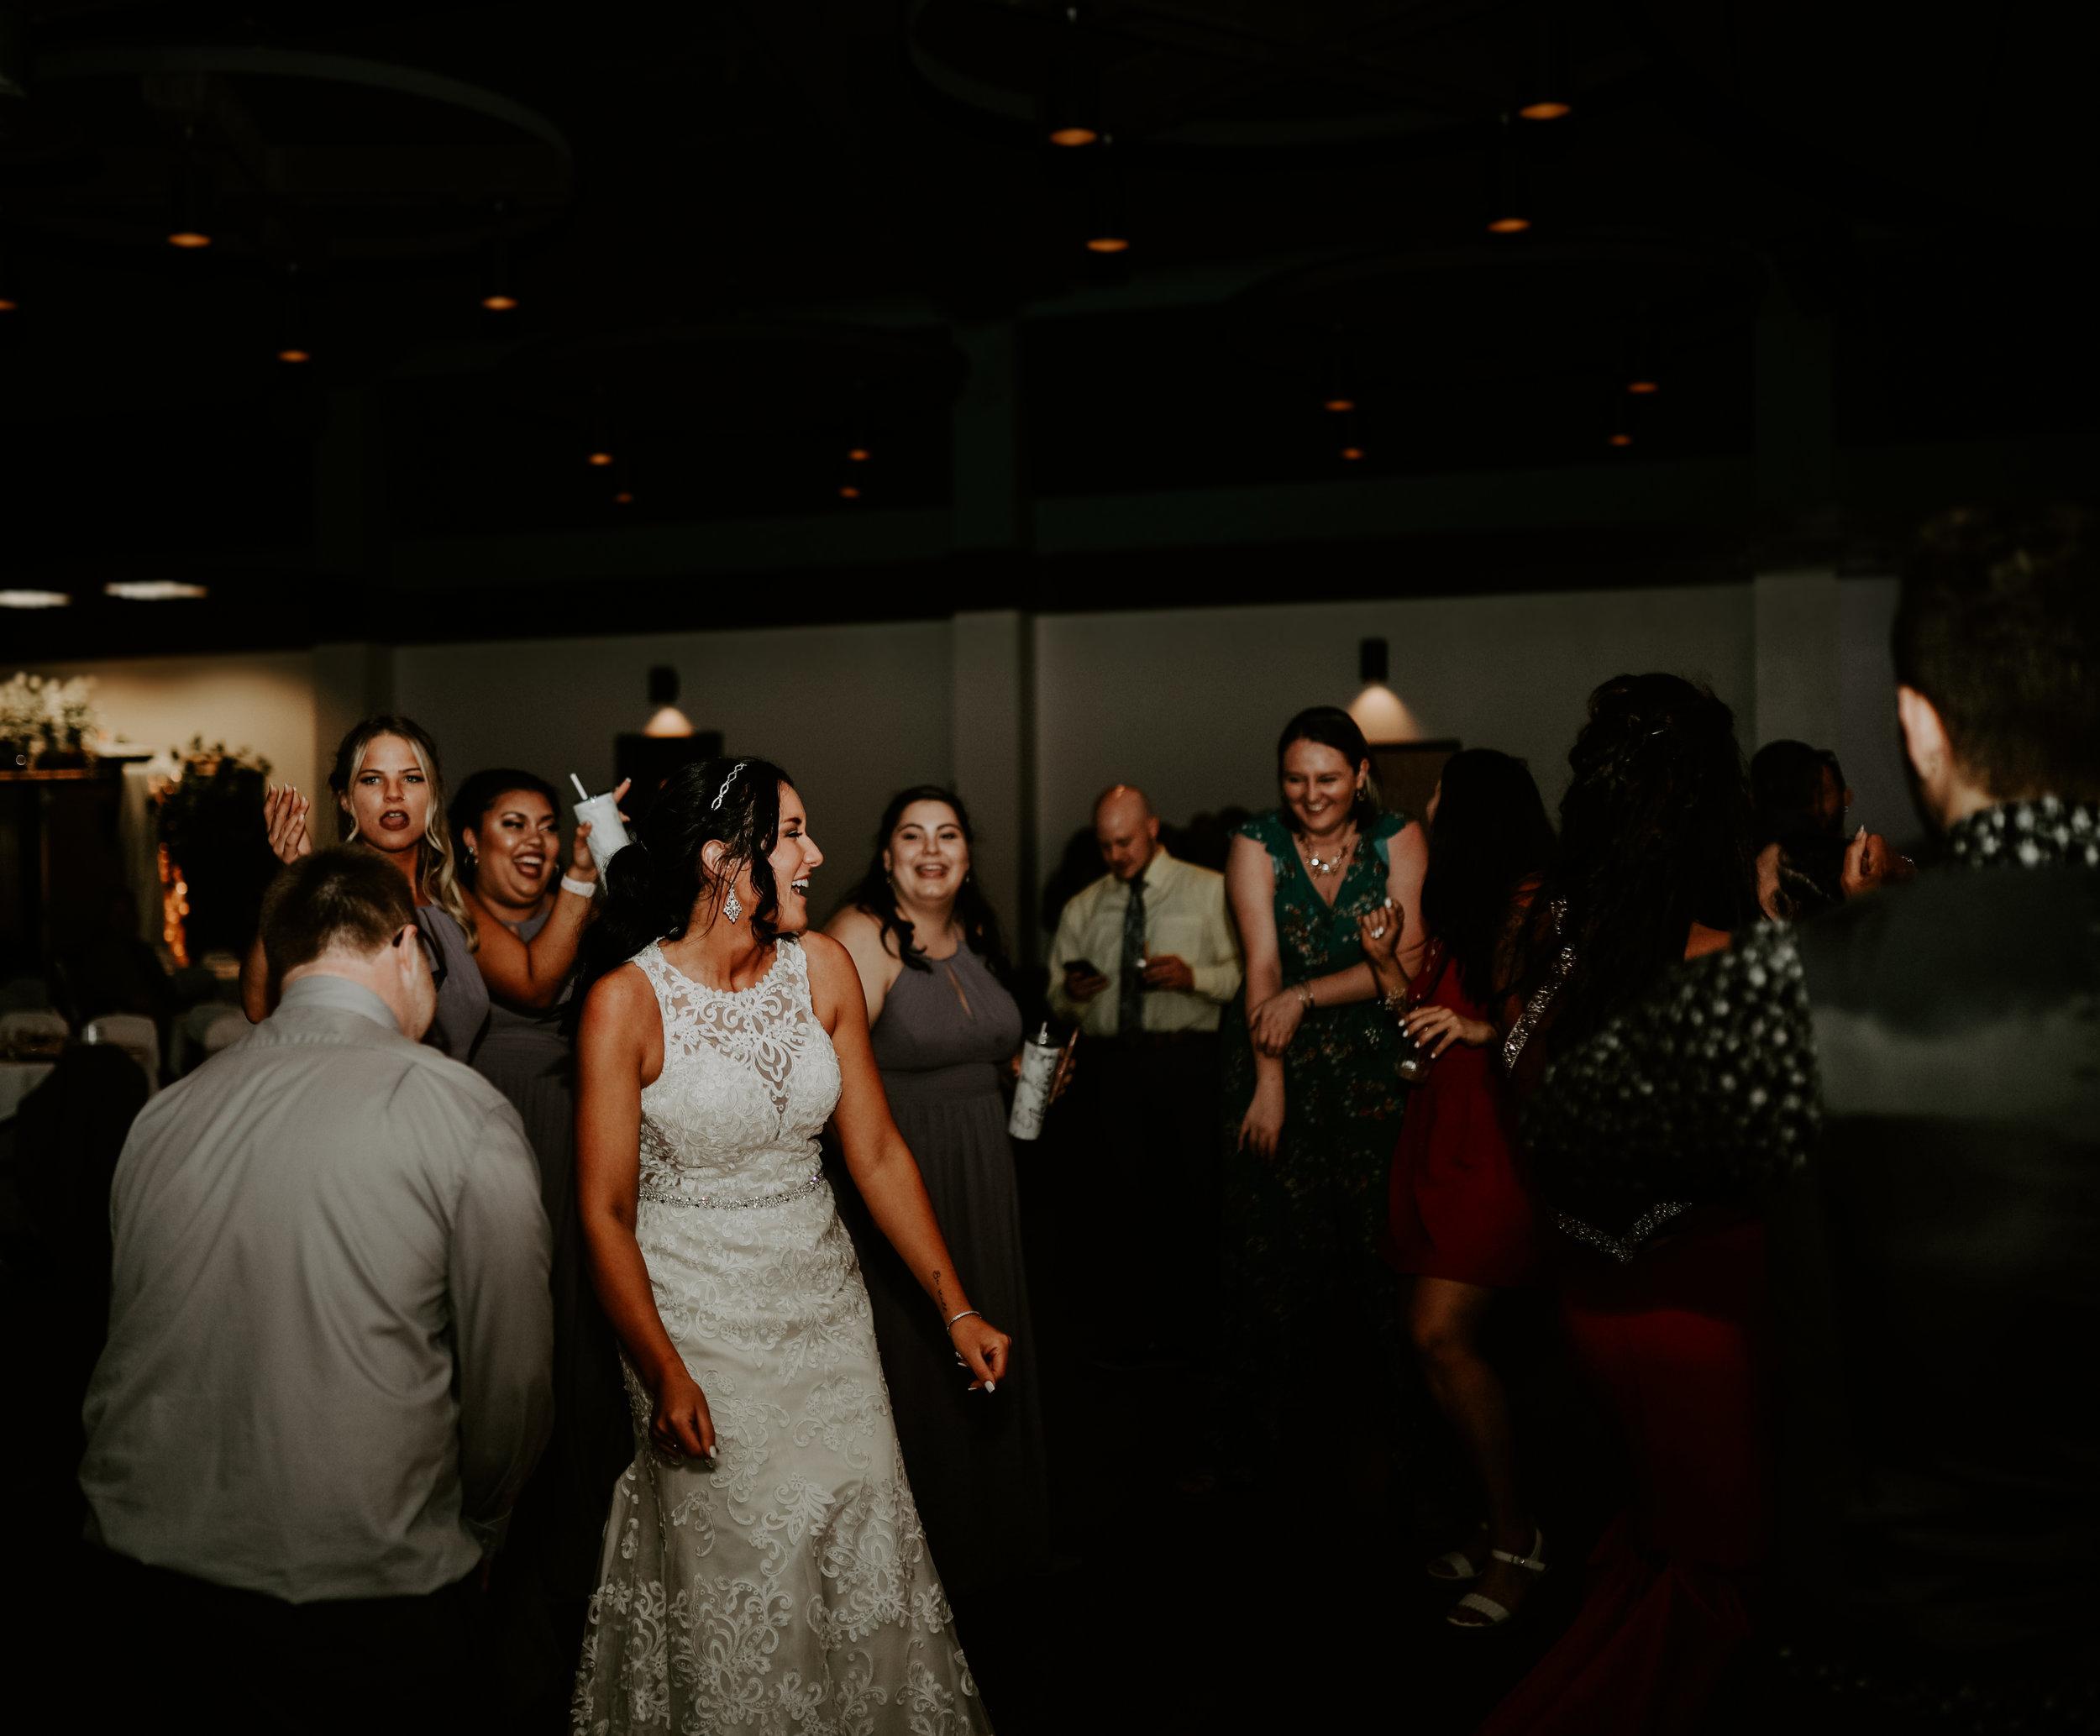 Kylei + Jordan wedding 299 (1 of 1).jpg